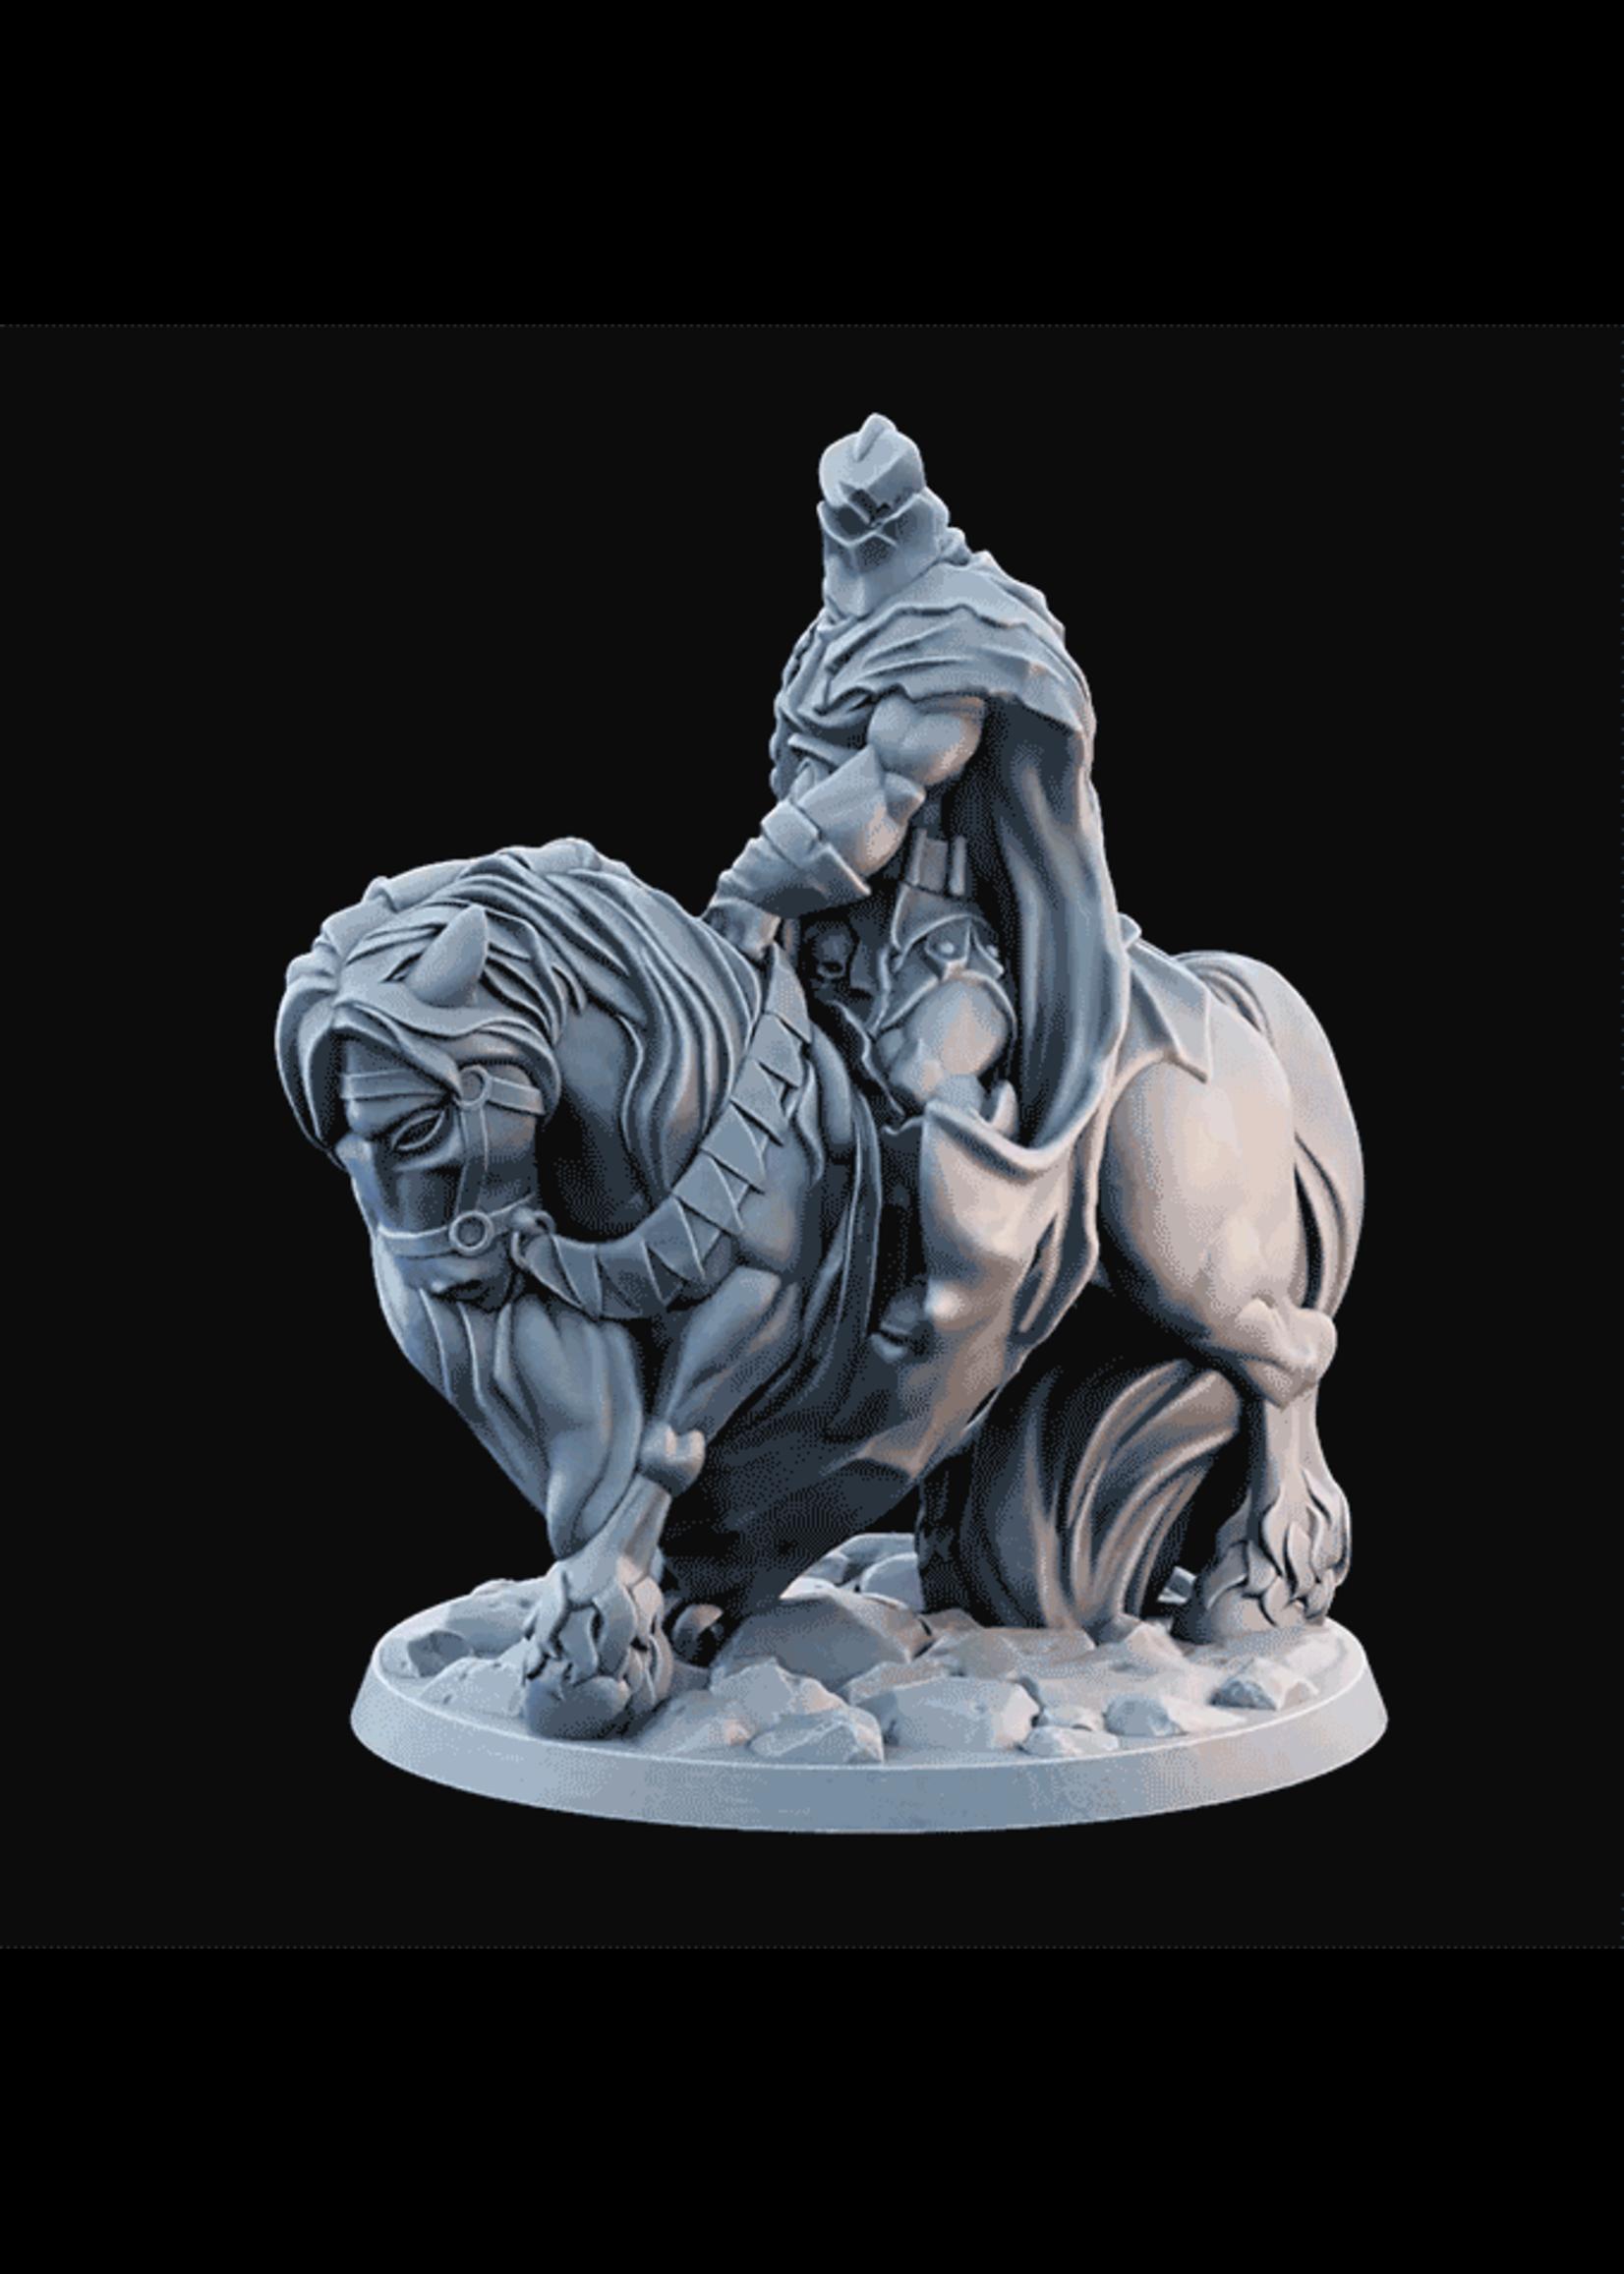 3D Printed Miniature - Fallenknightmounted02  - Dungeons & Dragons - Desolate Plains KS